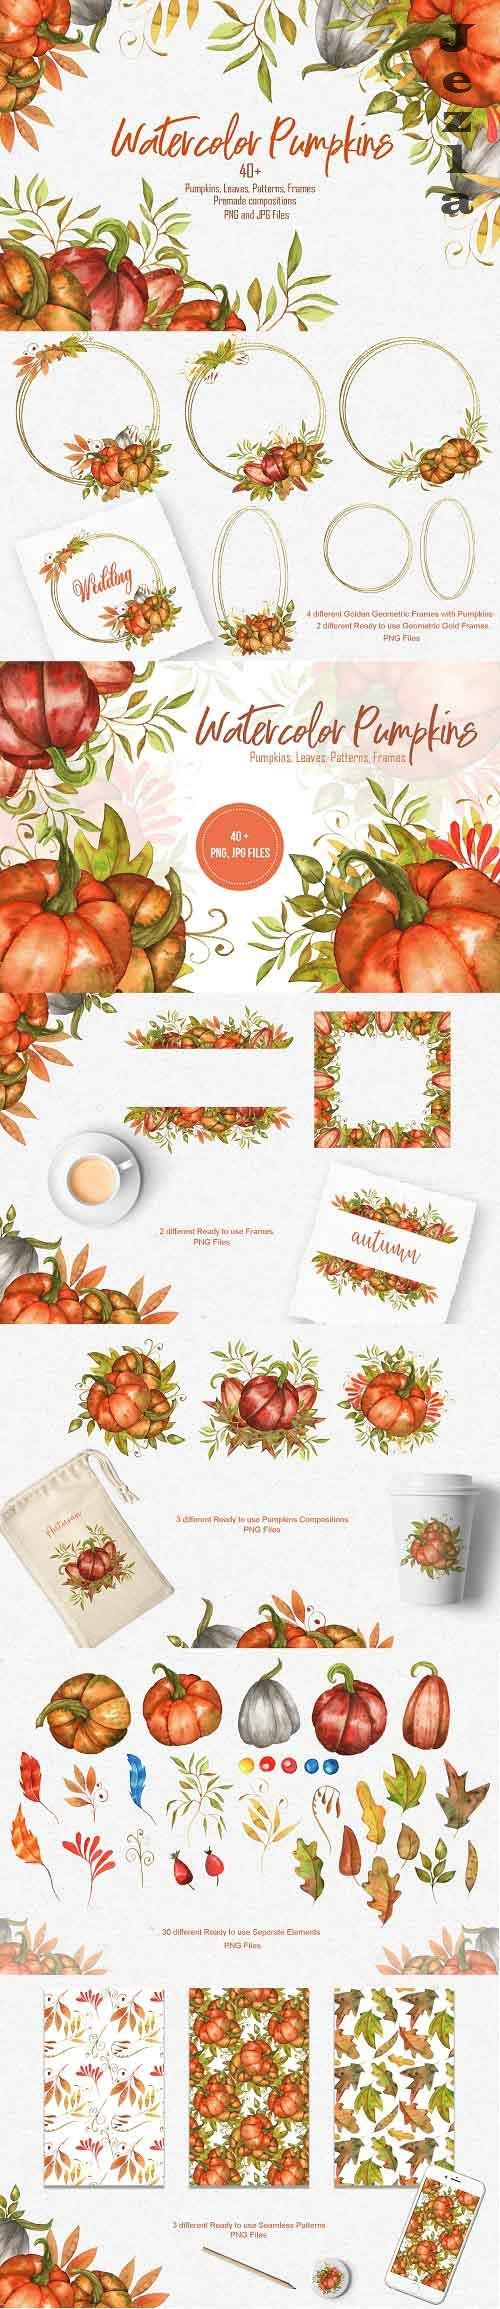 Watercolor Pumpkins Collection - 5493020